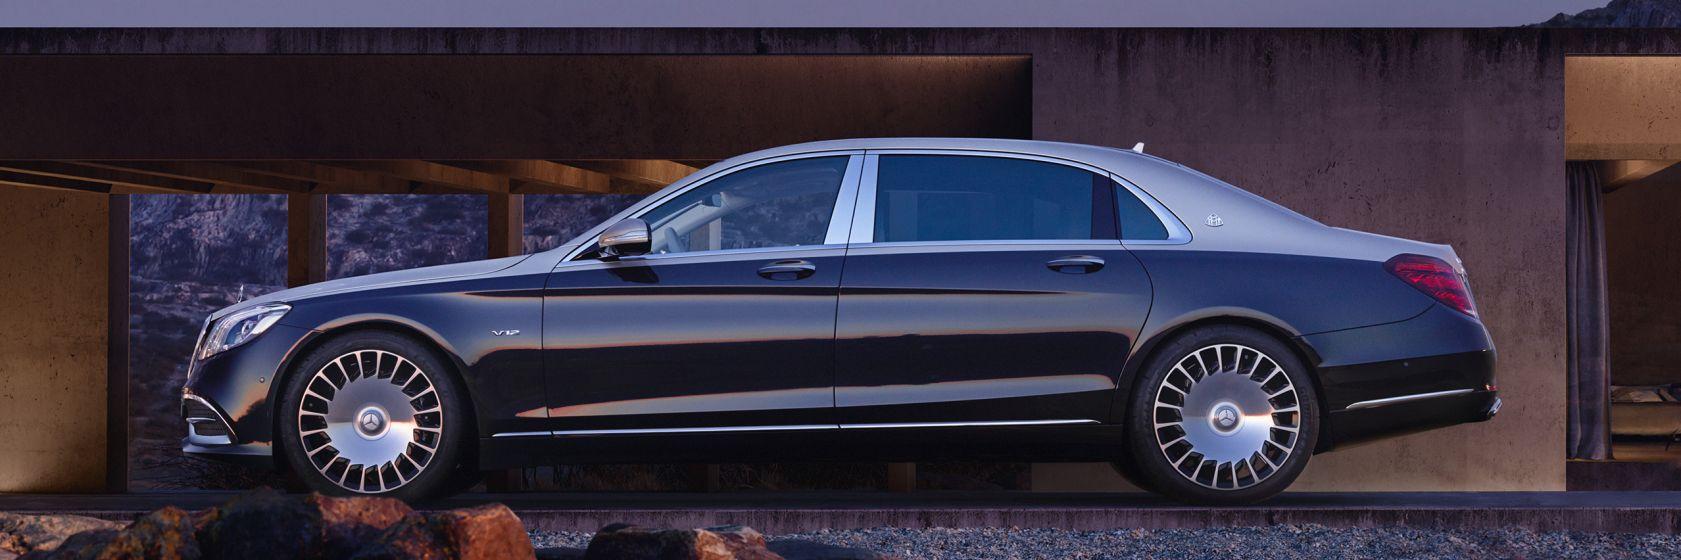 Classe S Mercedes Maybach Limousine Design